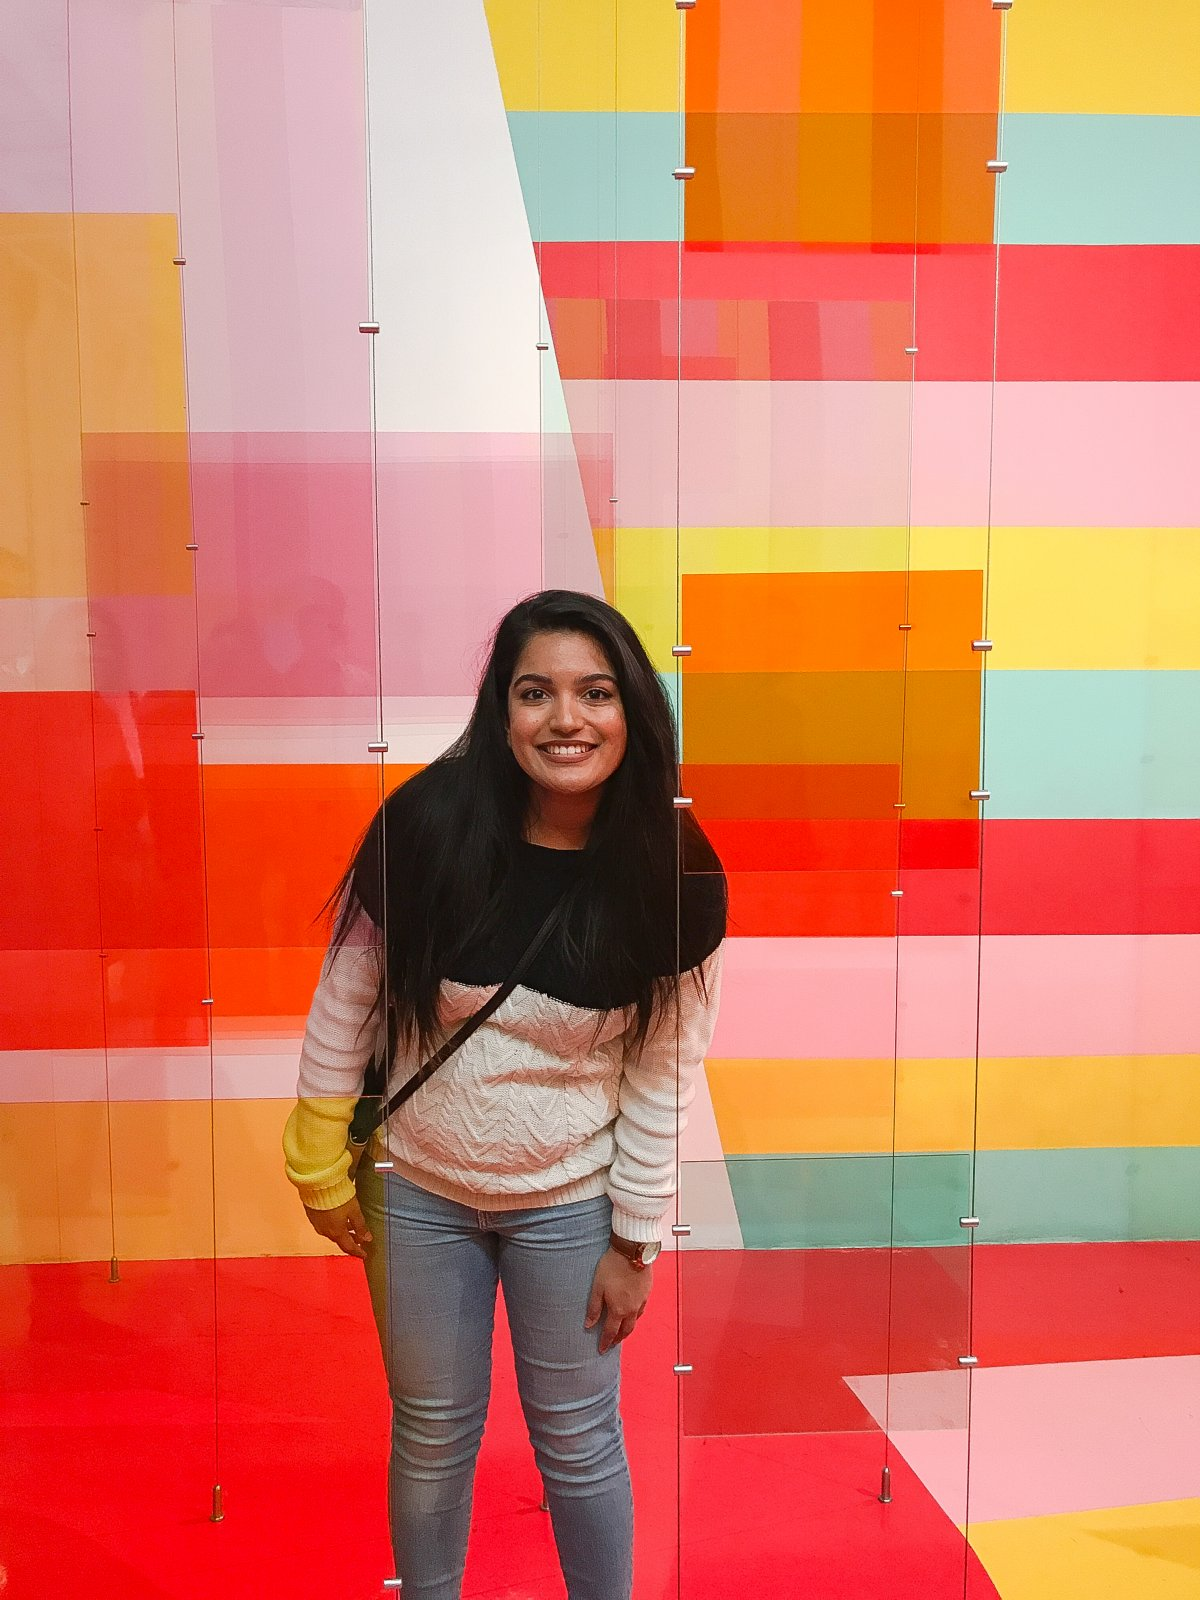 Museum of Ice Cream Color Room